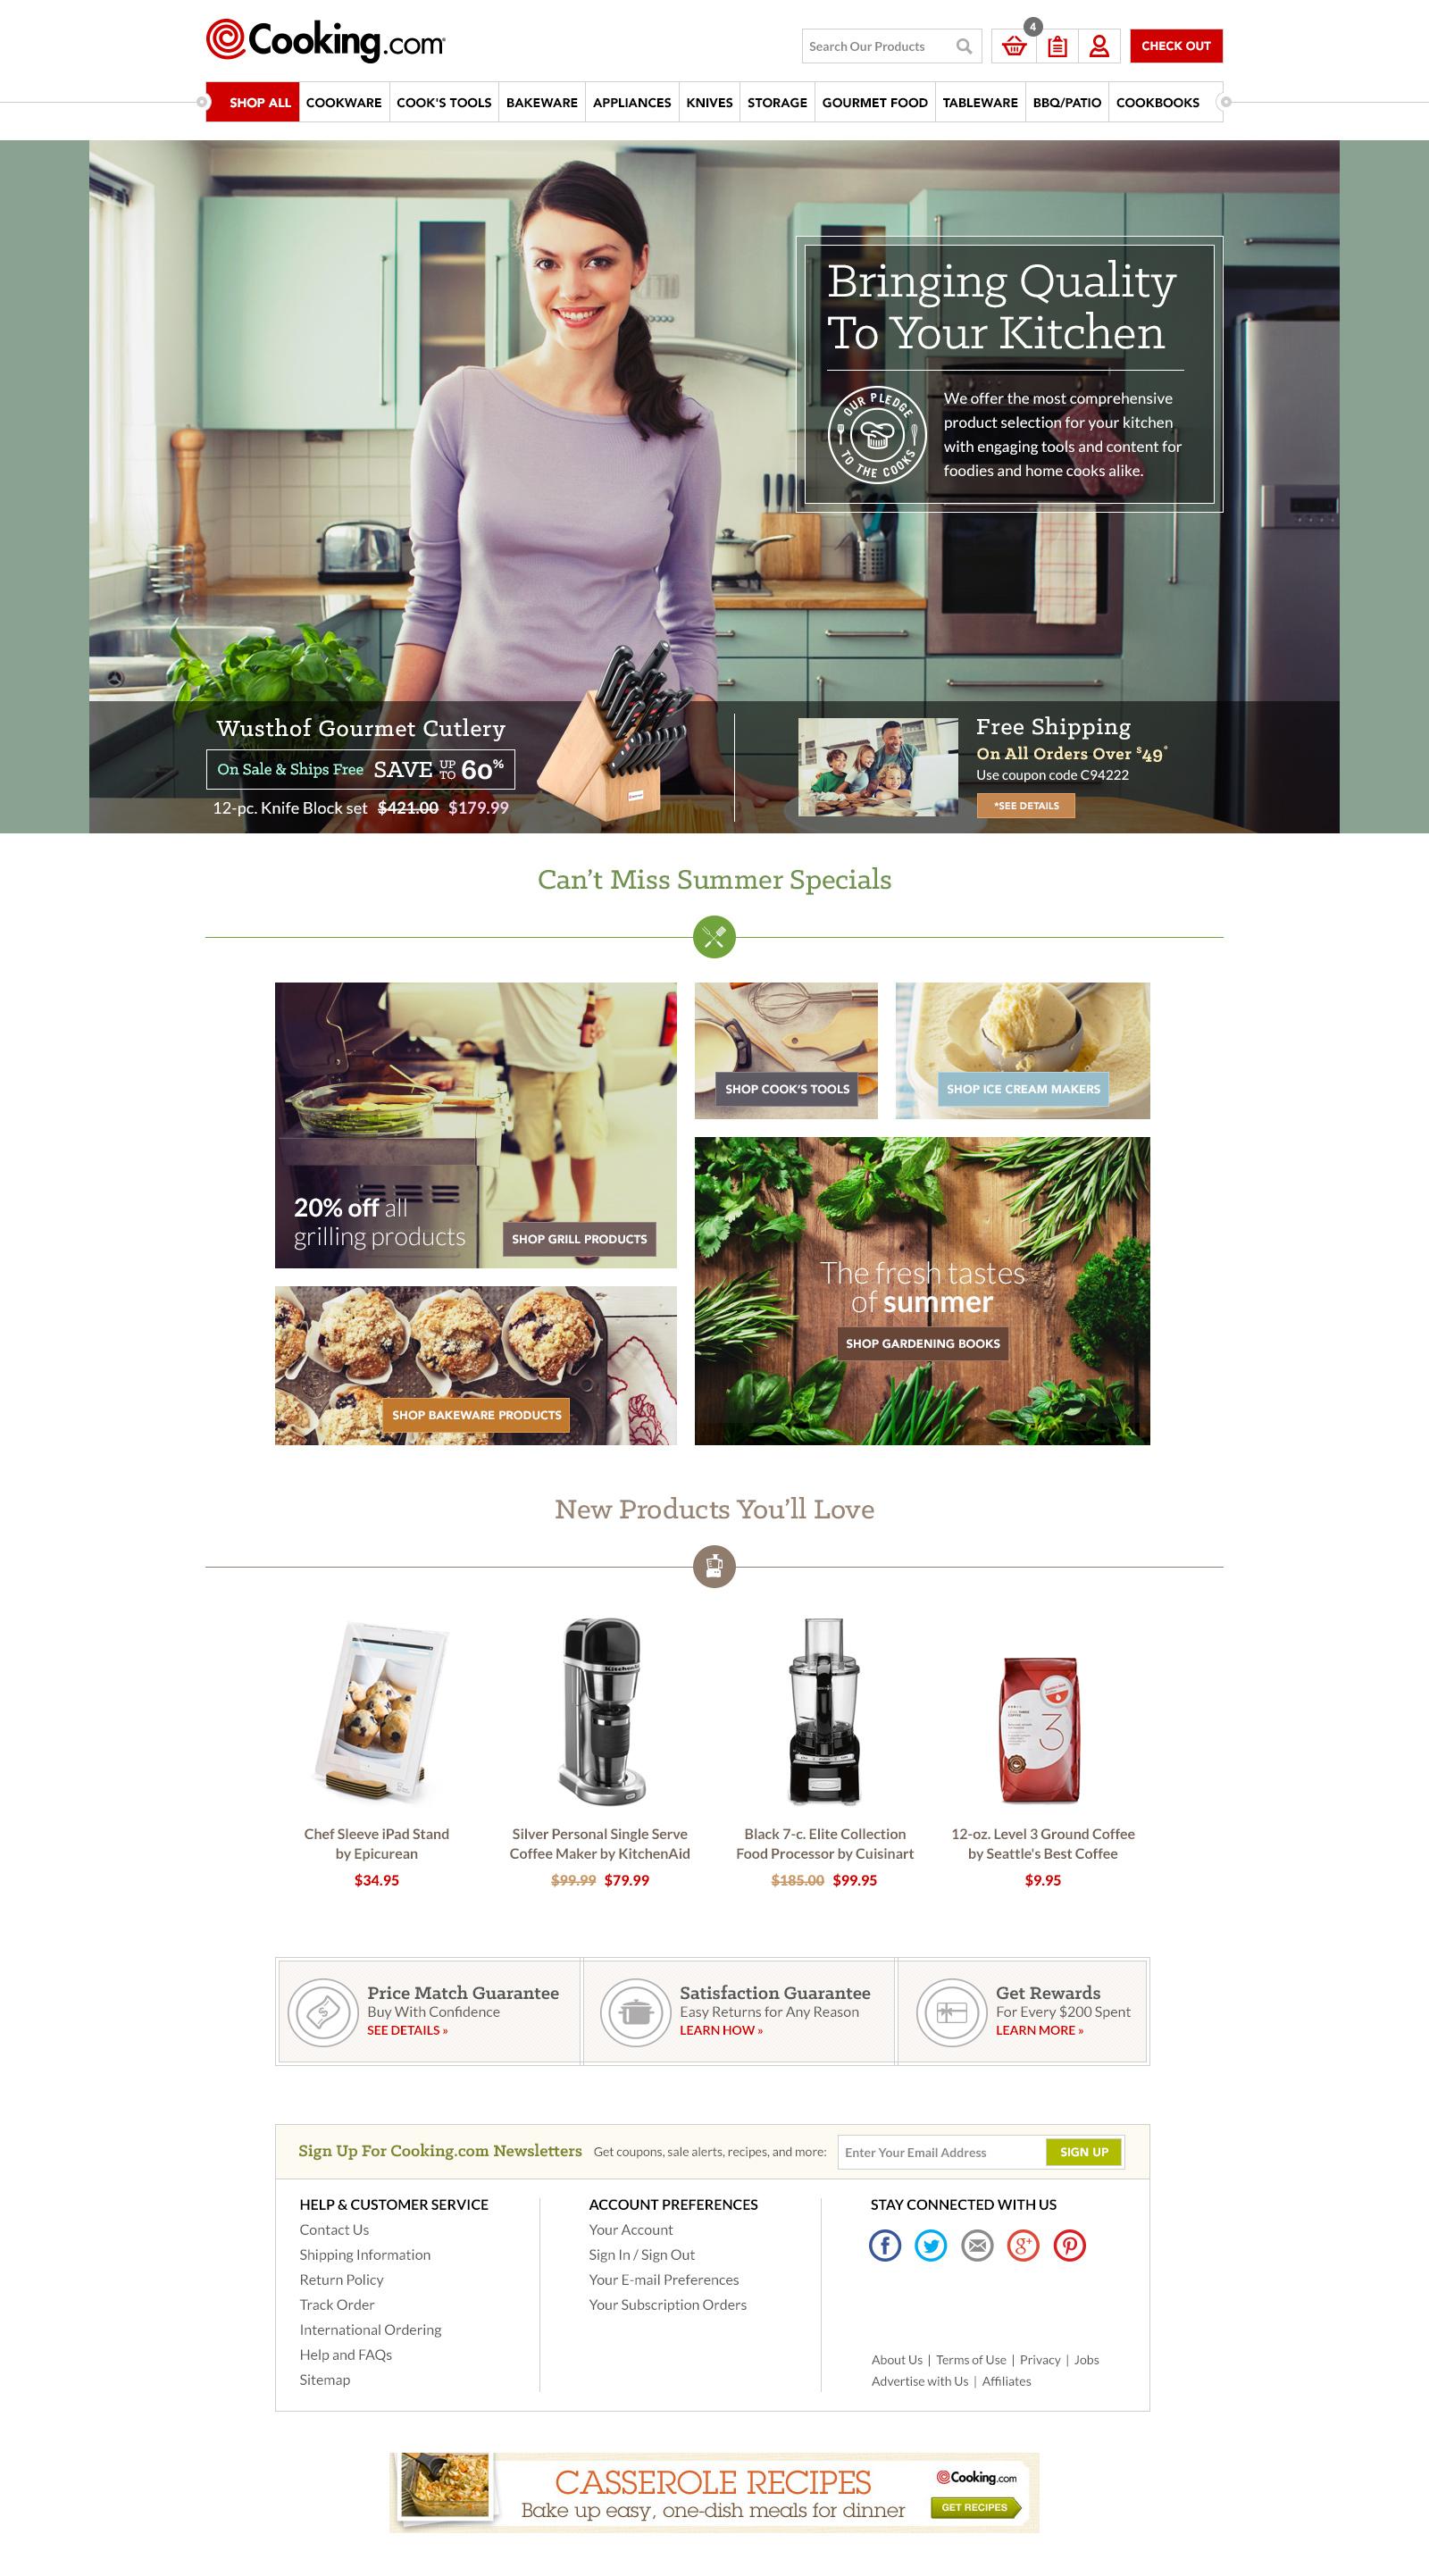 Cooking dot com homepage jk